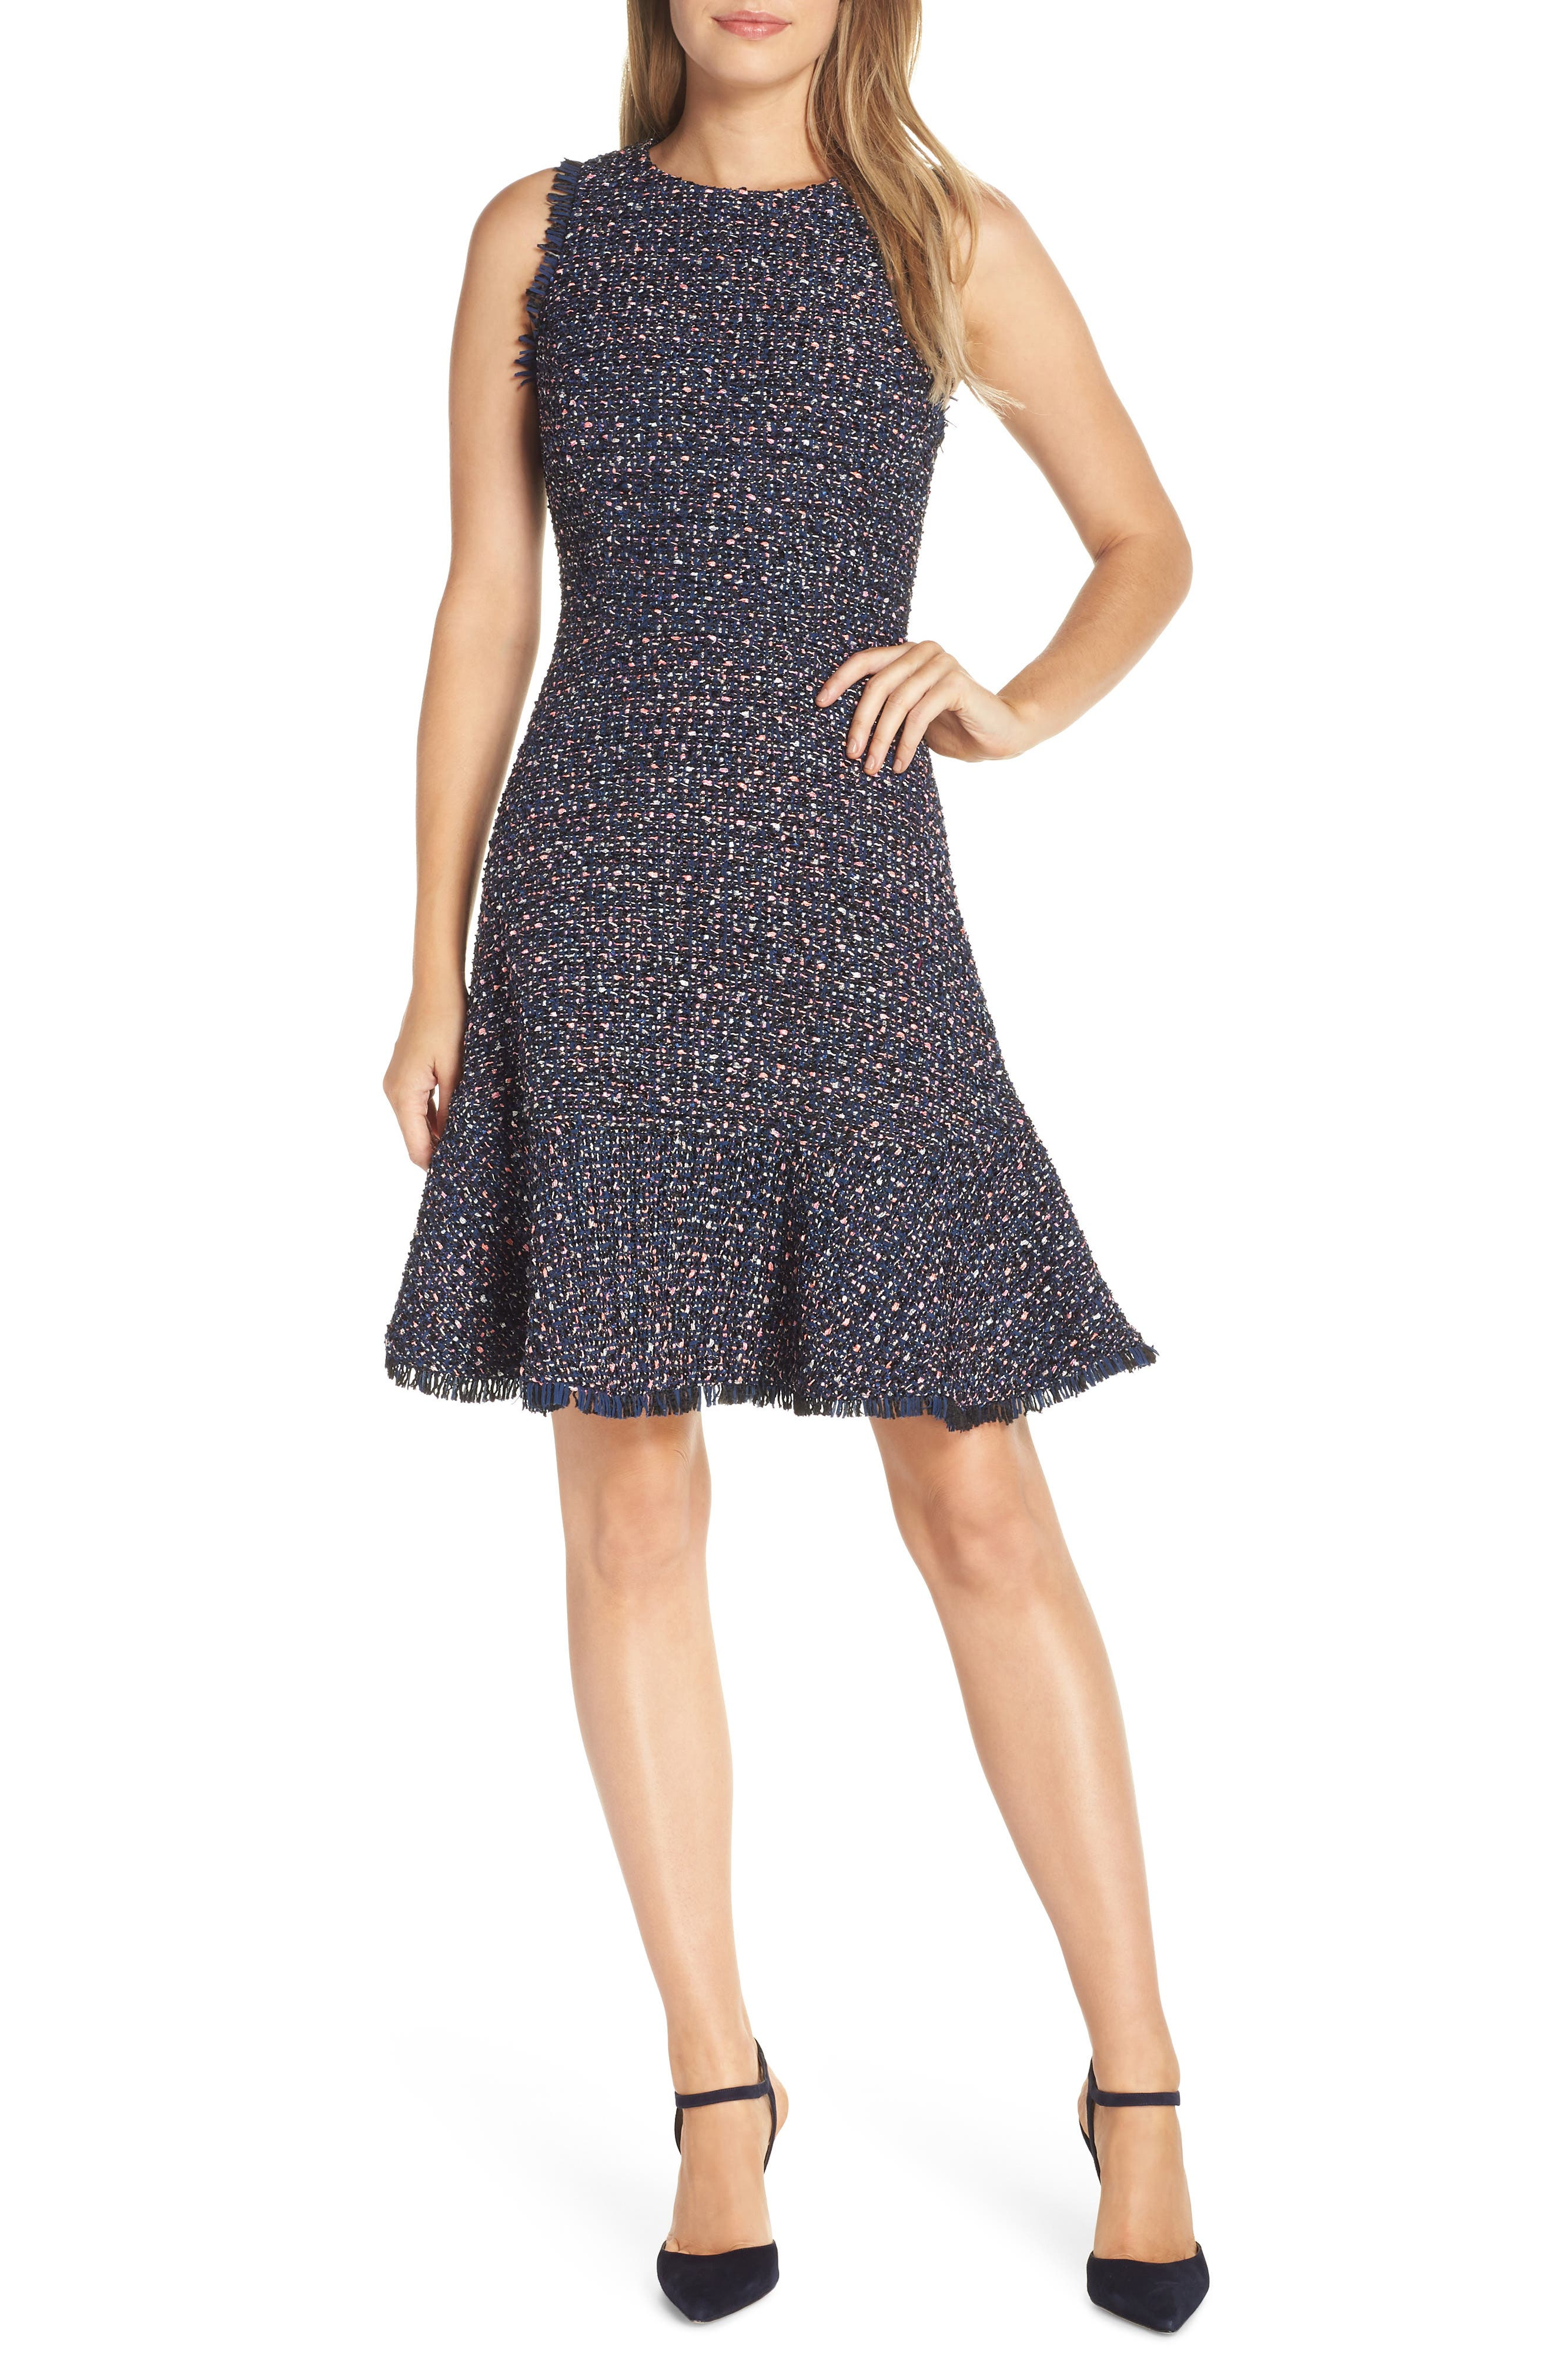 ELIZA J Sleeveless Tweed Fit & Flare Dress, Main, color, NAVY